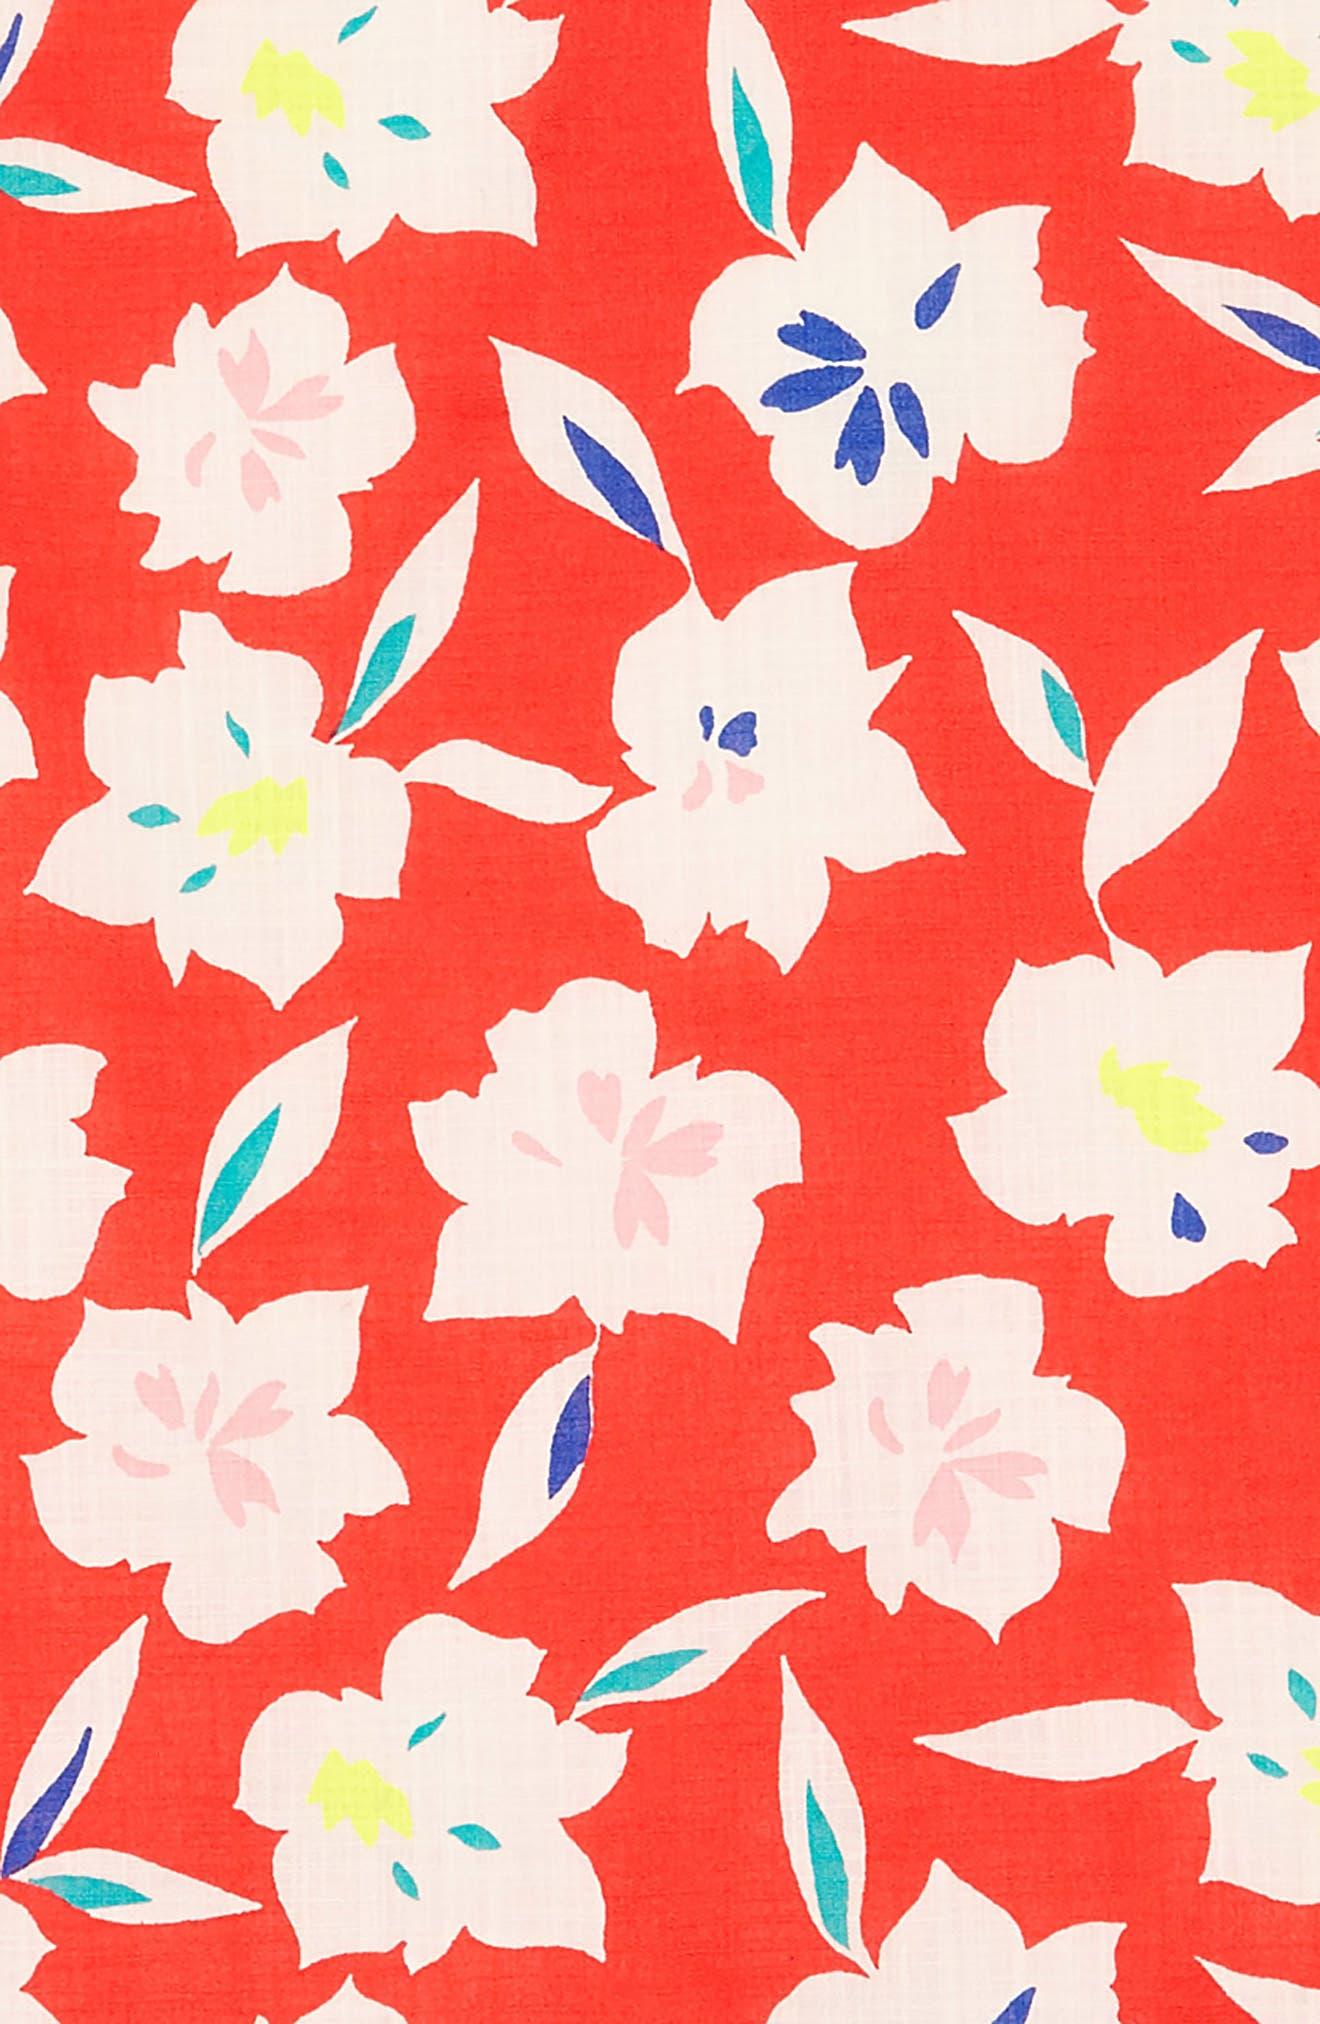 Floral Ruffle Trim Dress,                             Alternate thumbnail 3, color,                             650